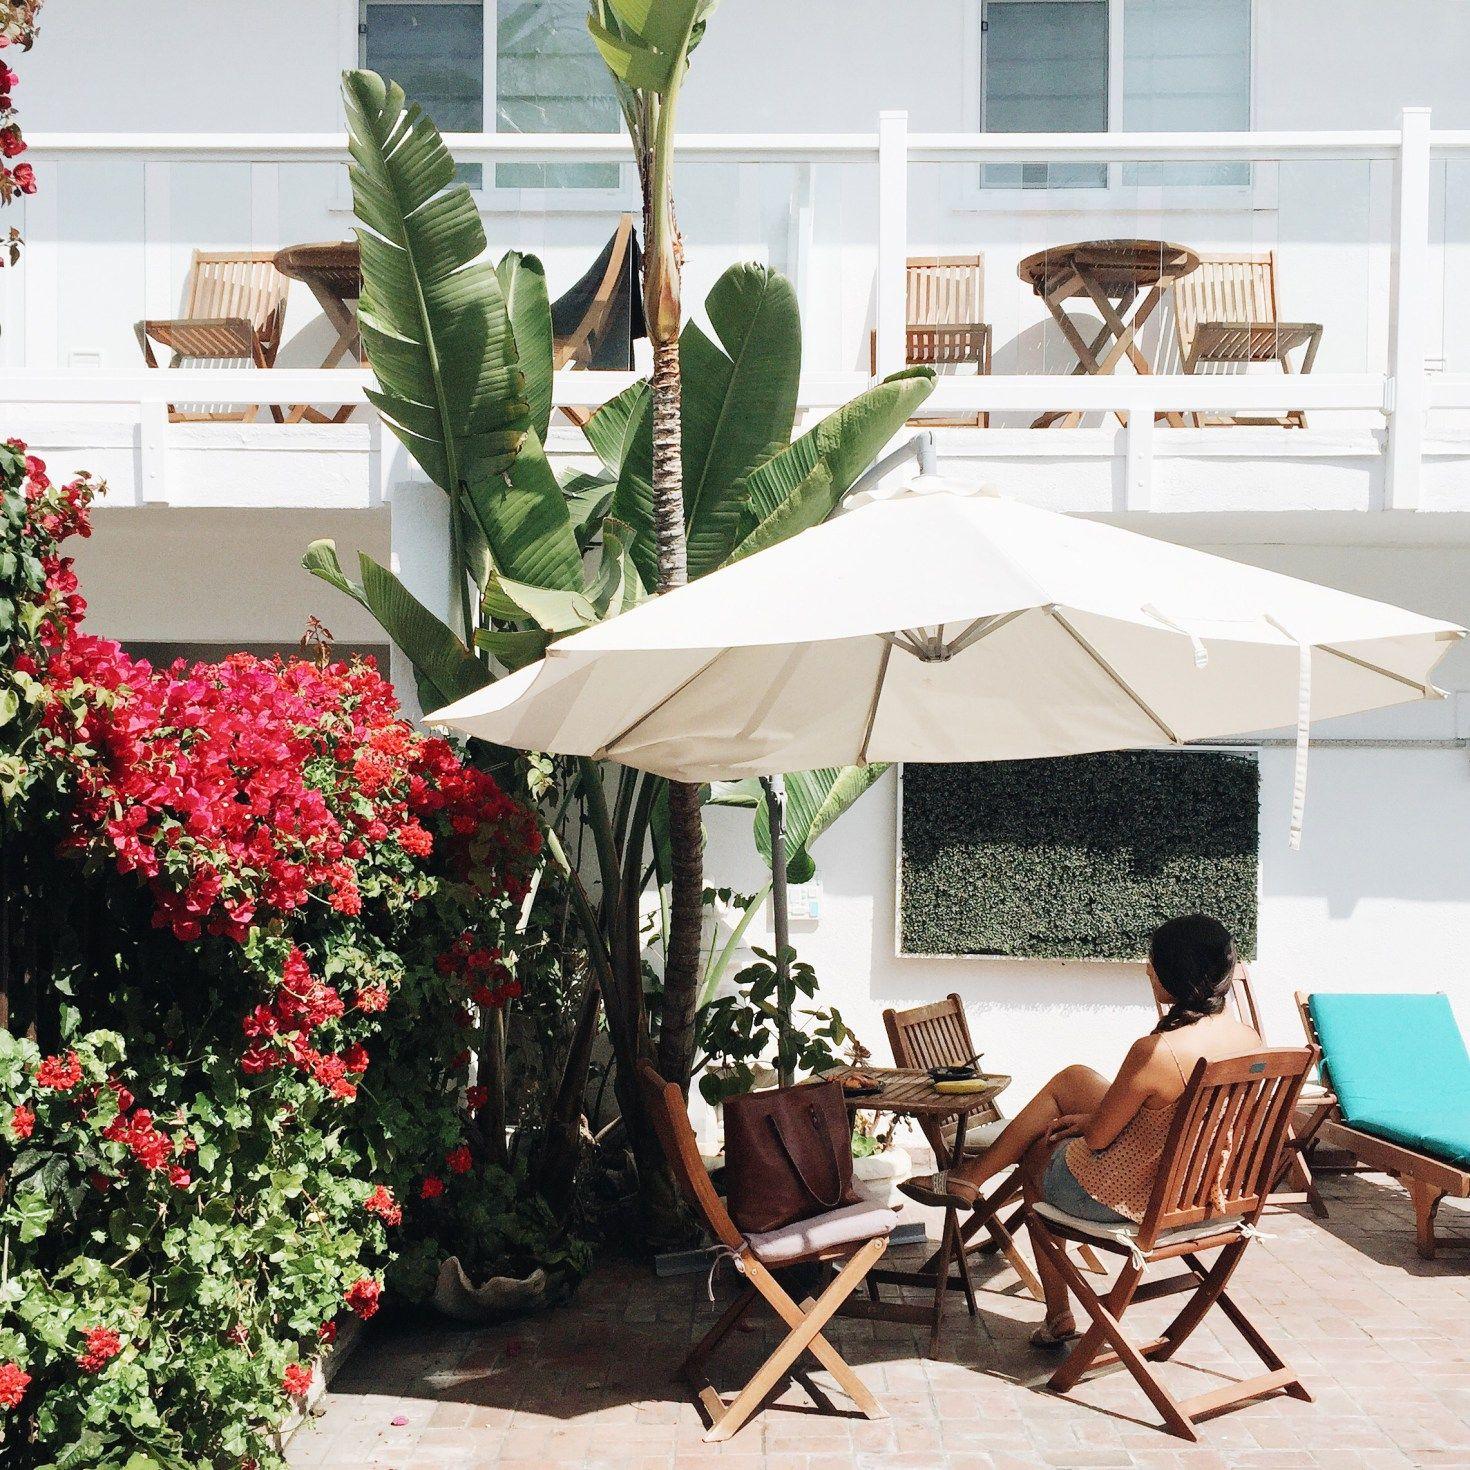 Capri Laguna Hotel - Traveling to Laguna Beach, CA  - elanaloo.com